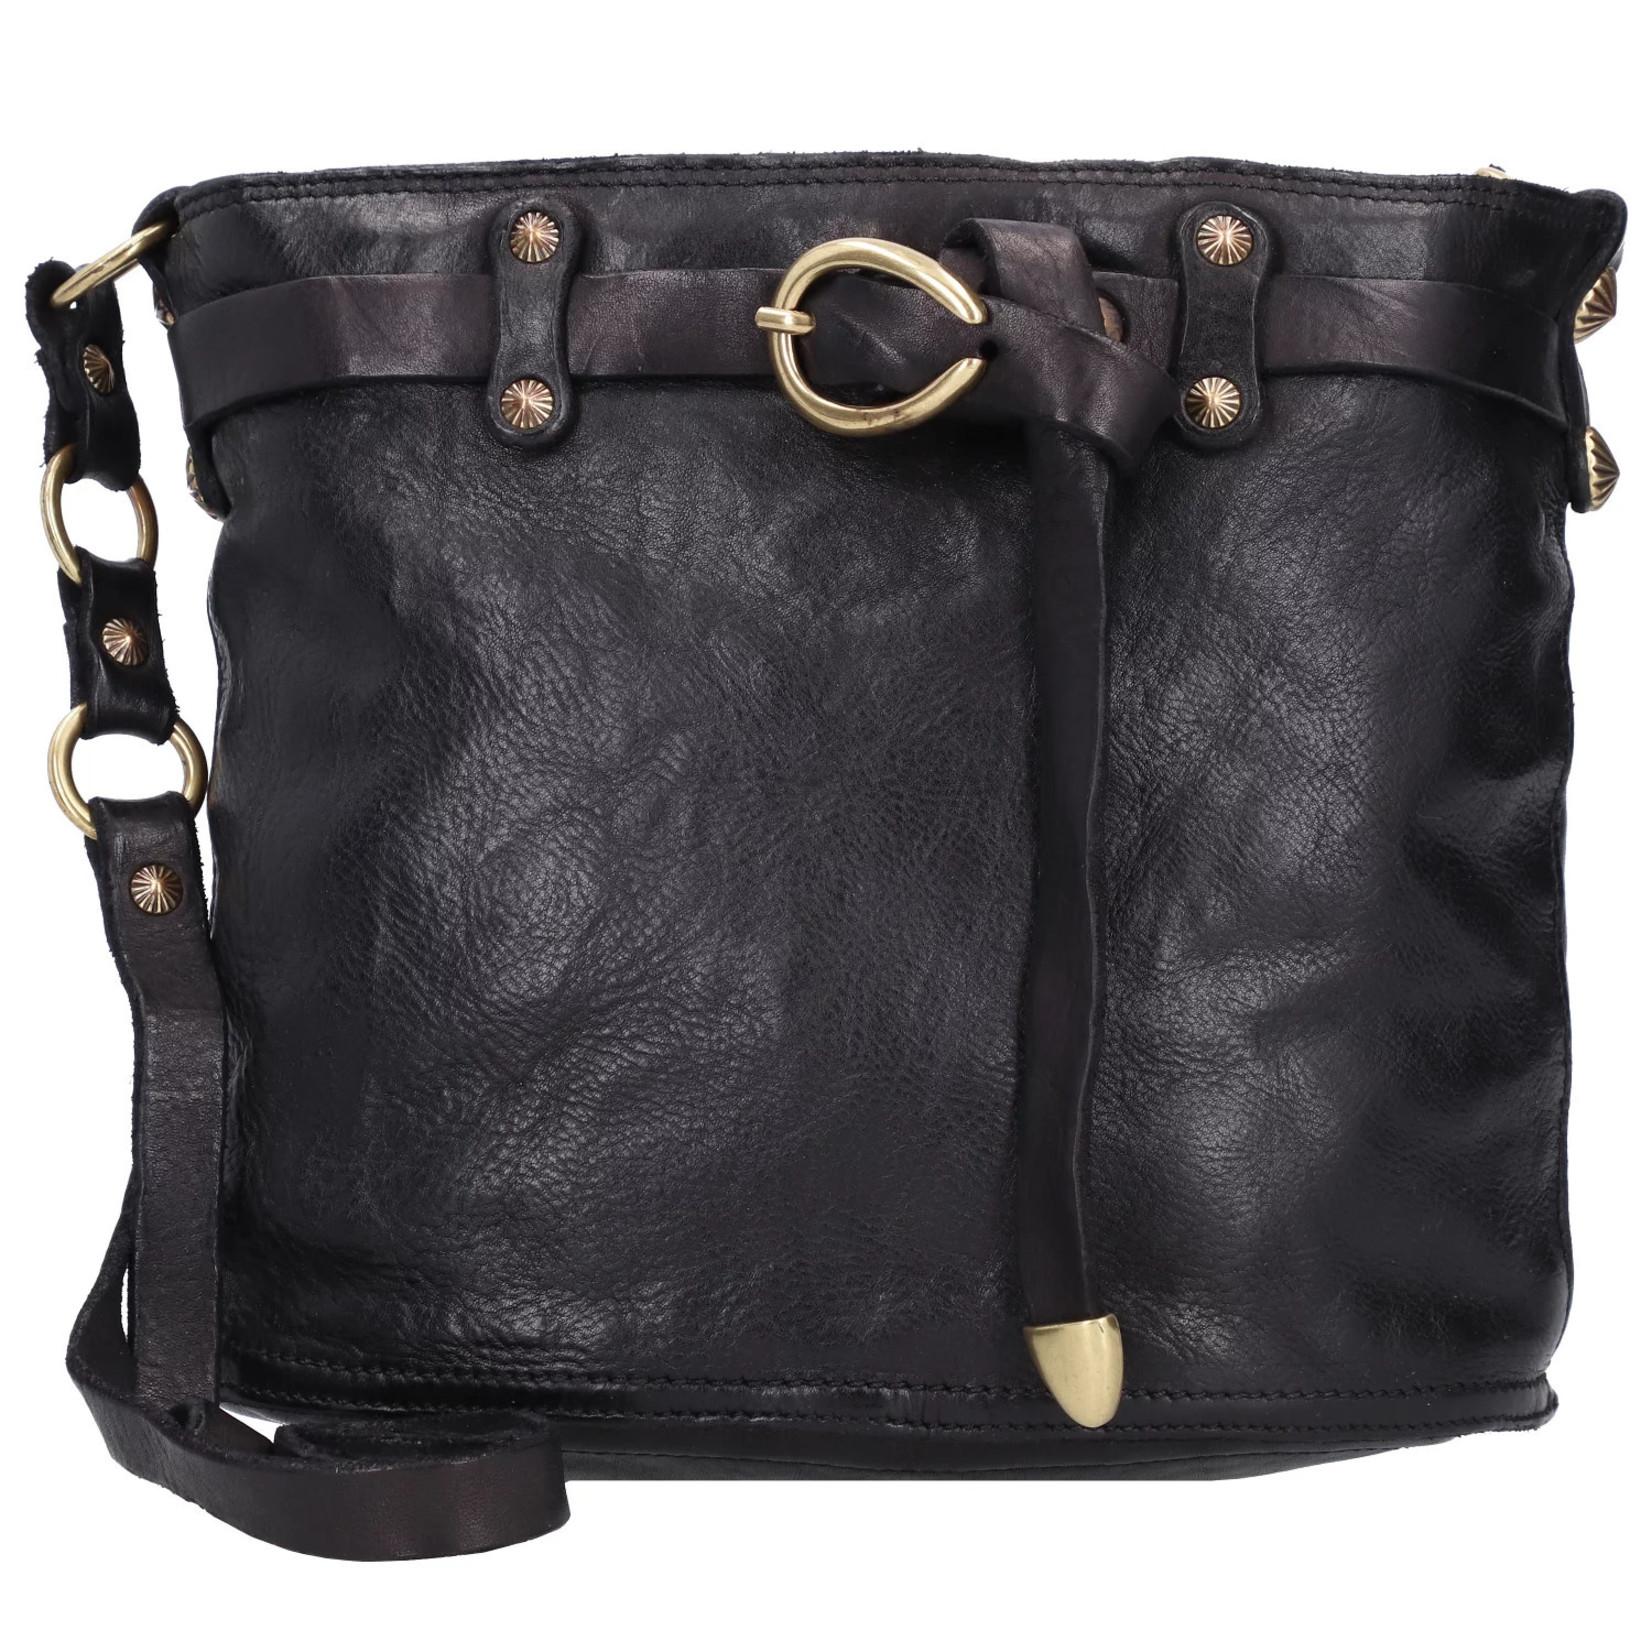 Campomaggi Bucket Bag Black